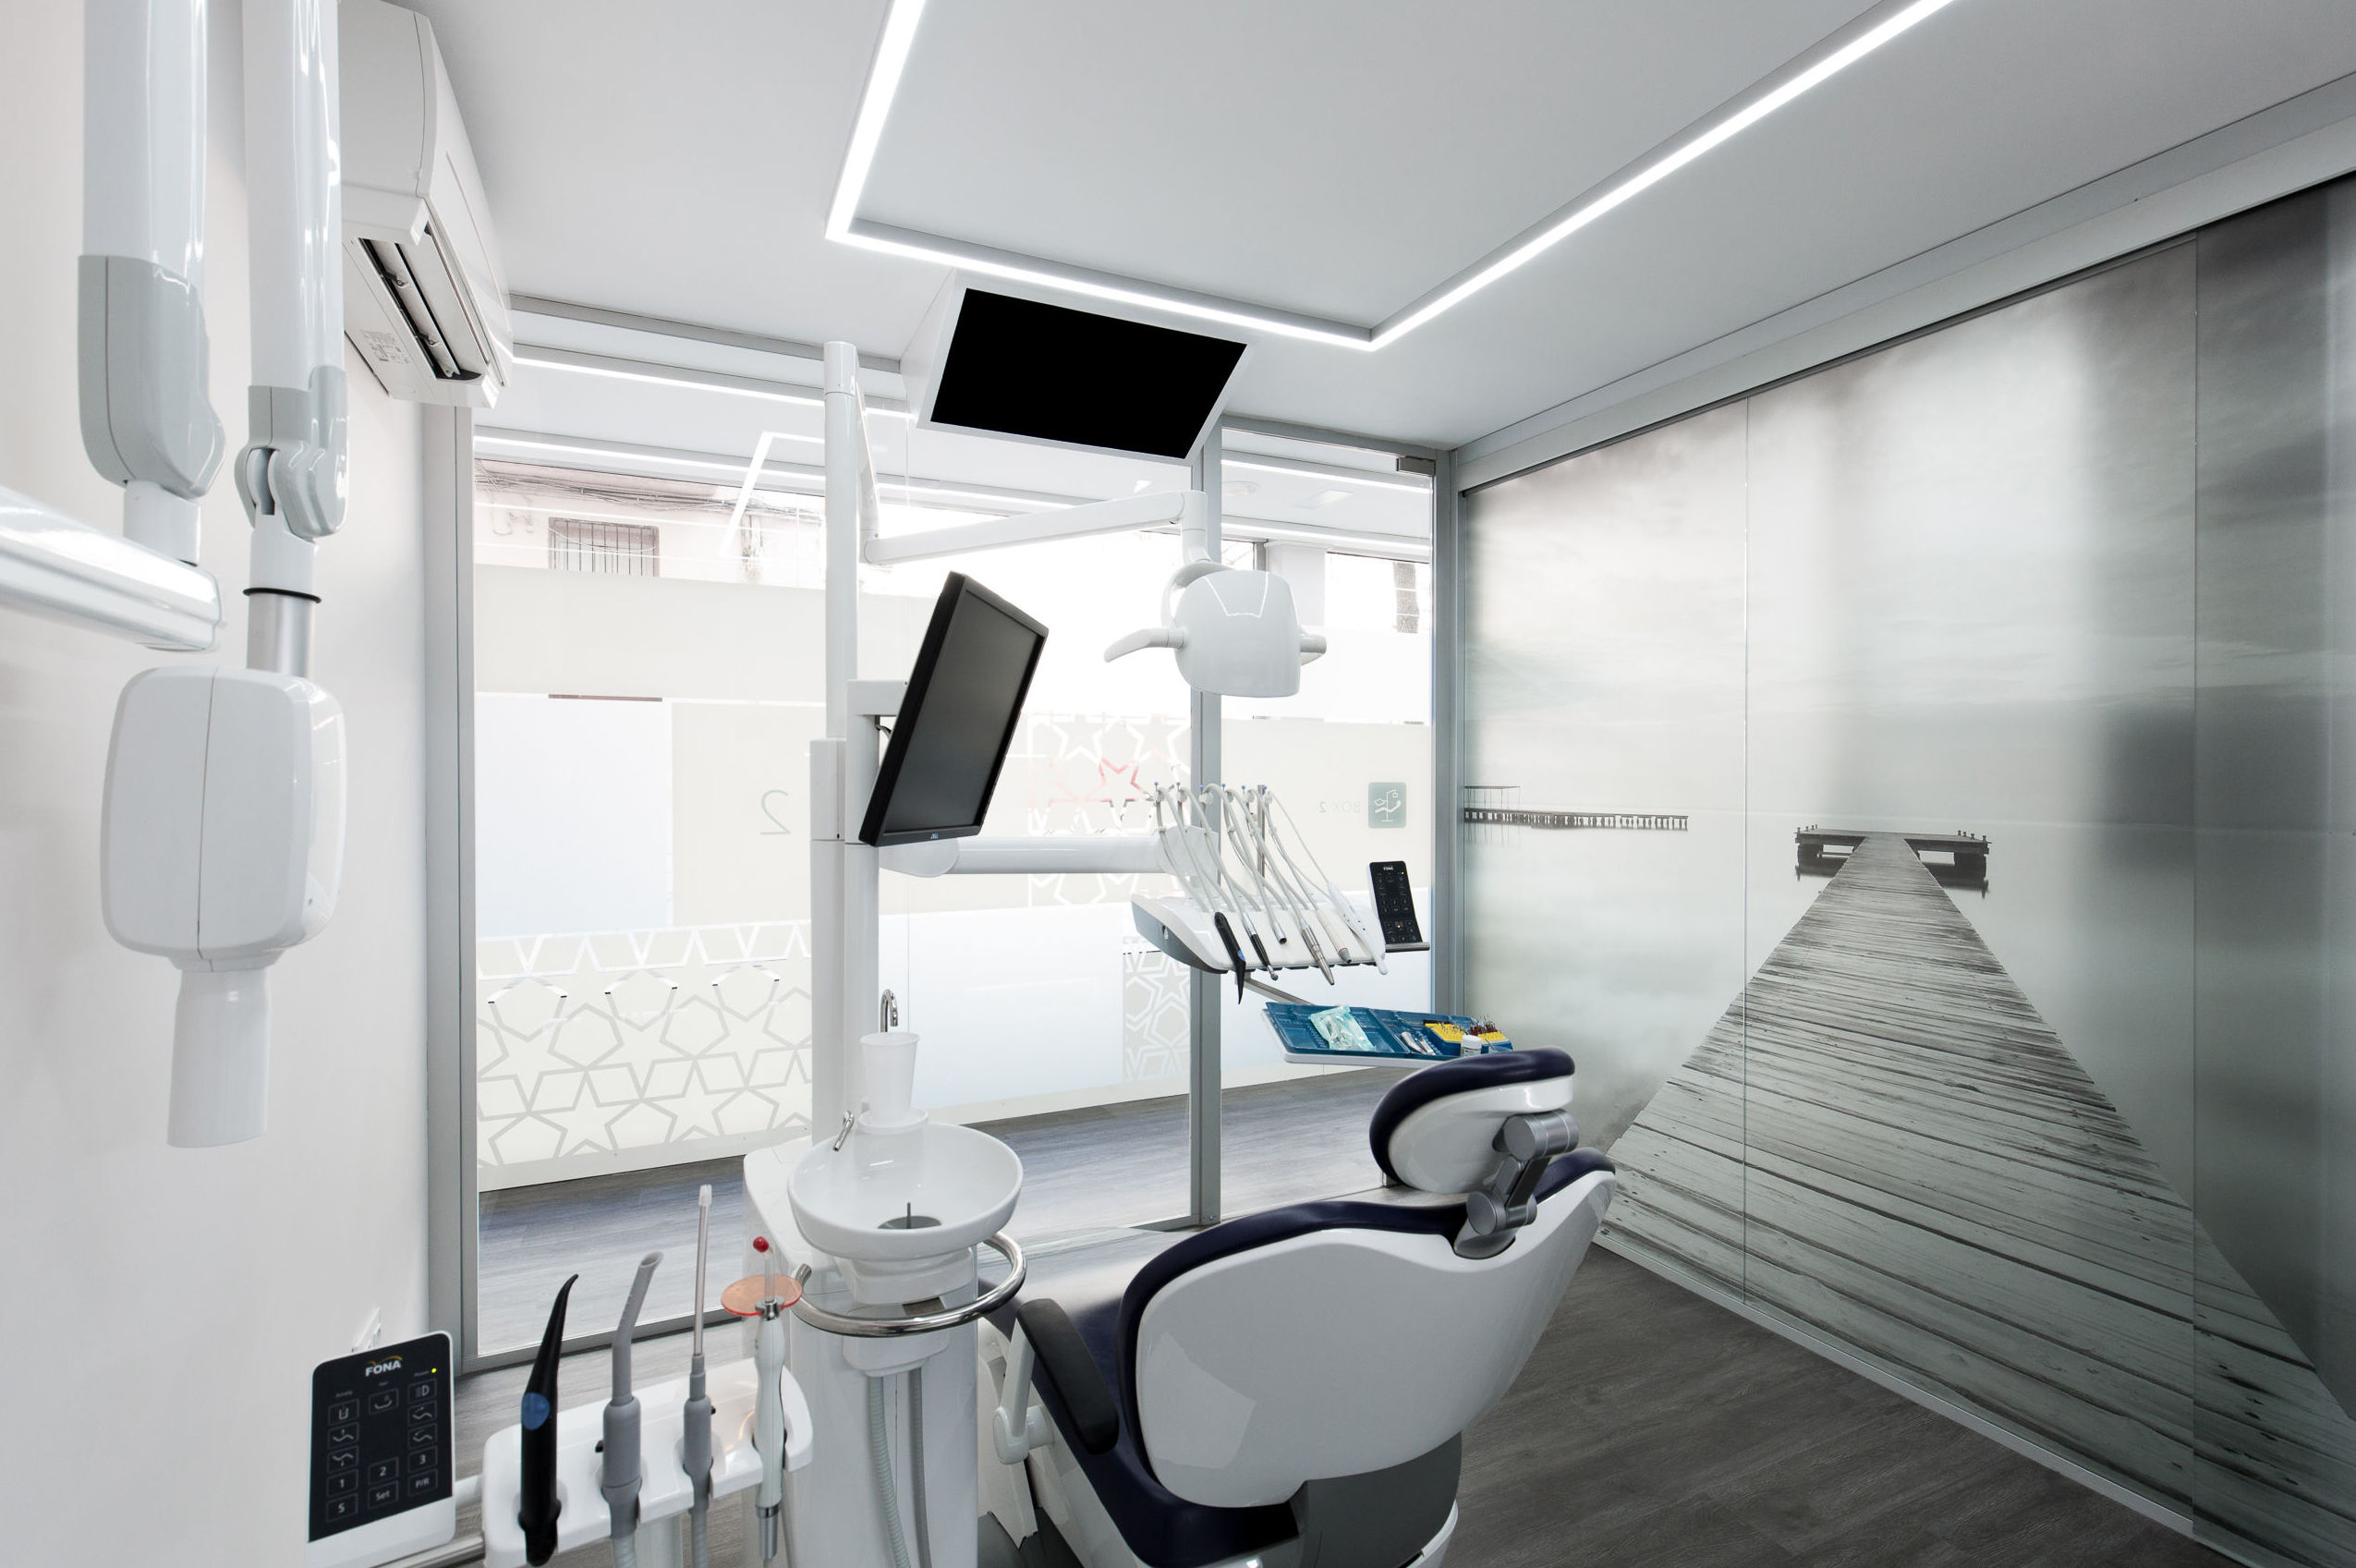 Consulta Eurodent Clínica Dental